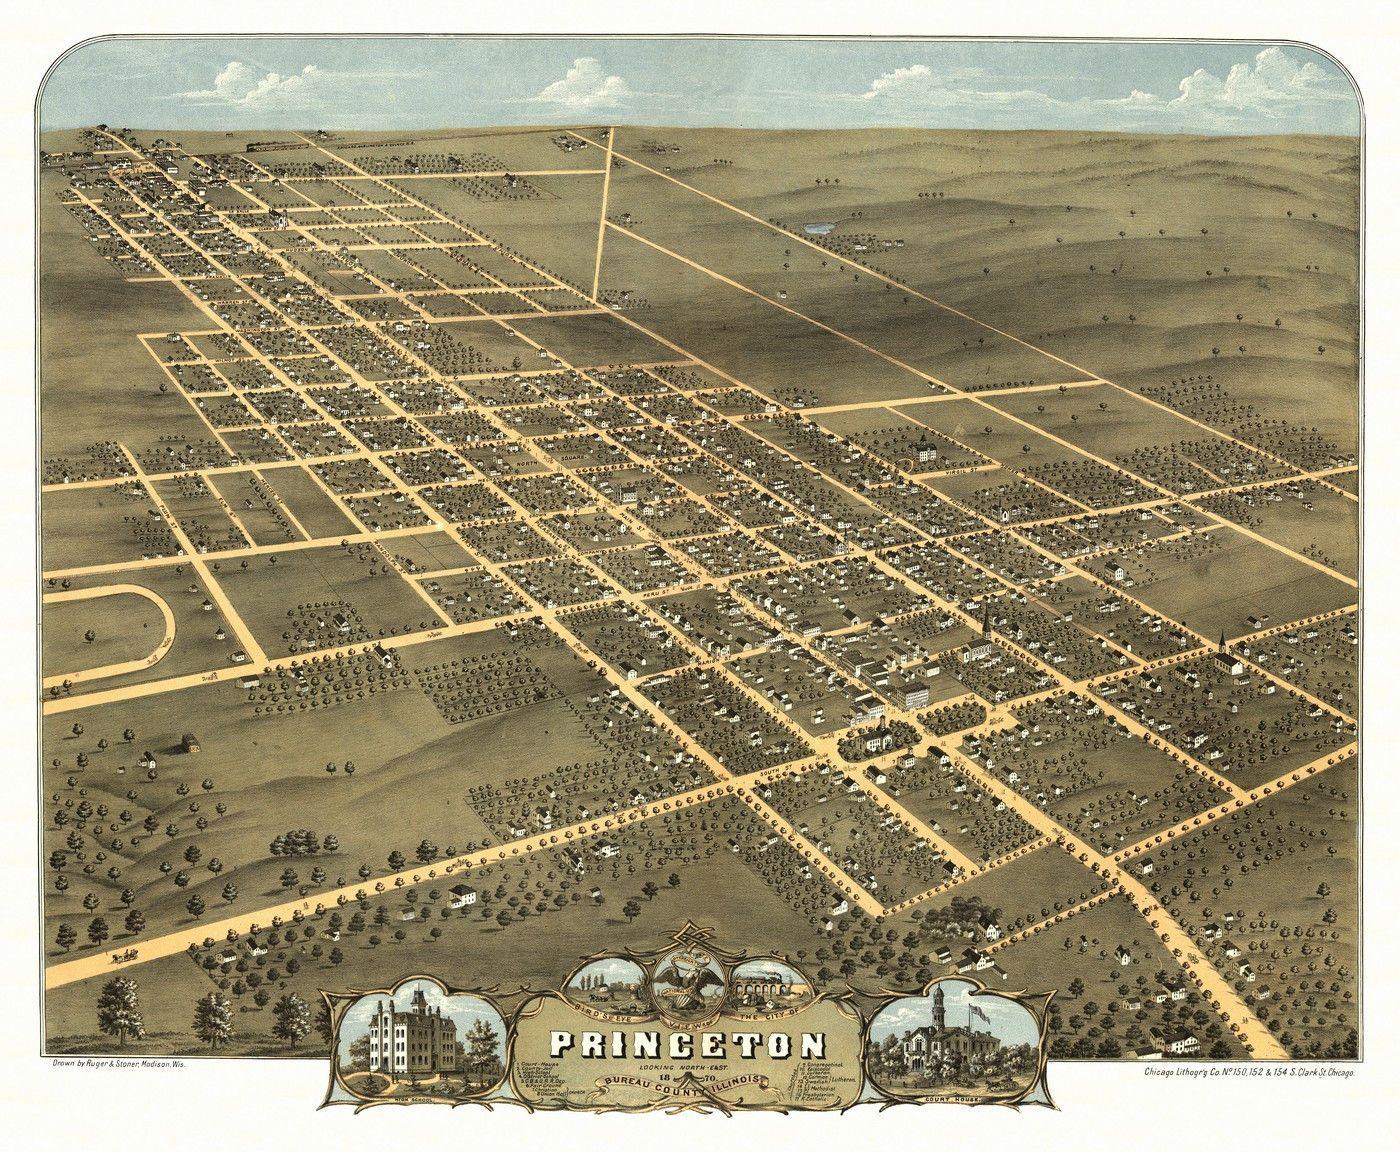 Illinois bureau county princeton - Vintage Map Of Princeton Illinois 1870 Princeton Bureau County Poster